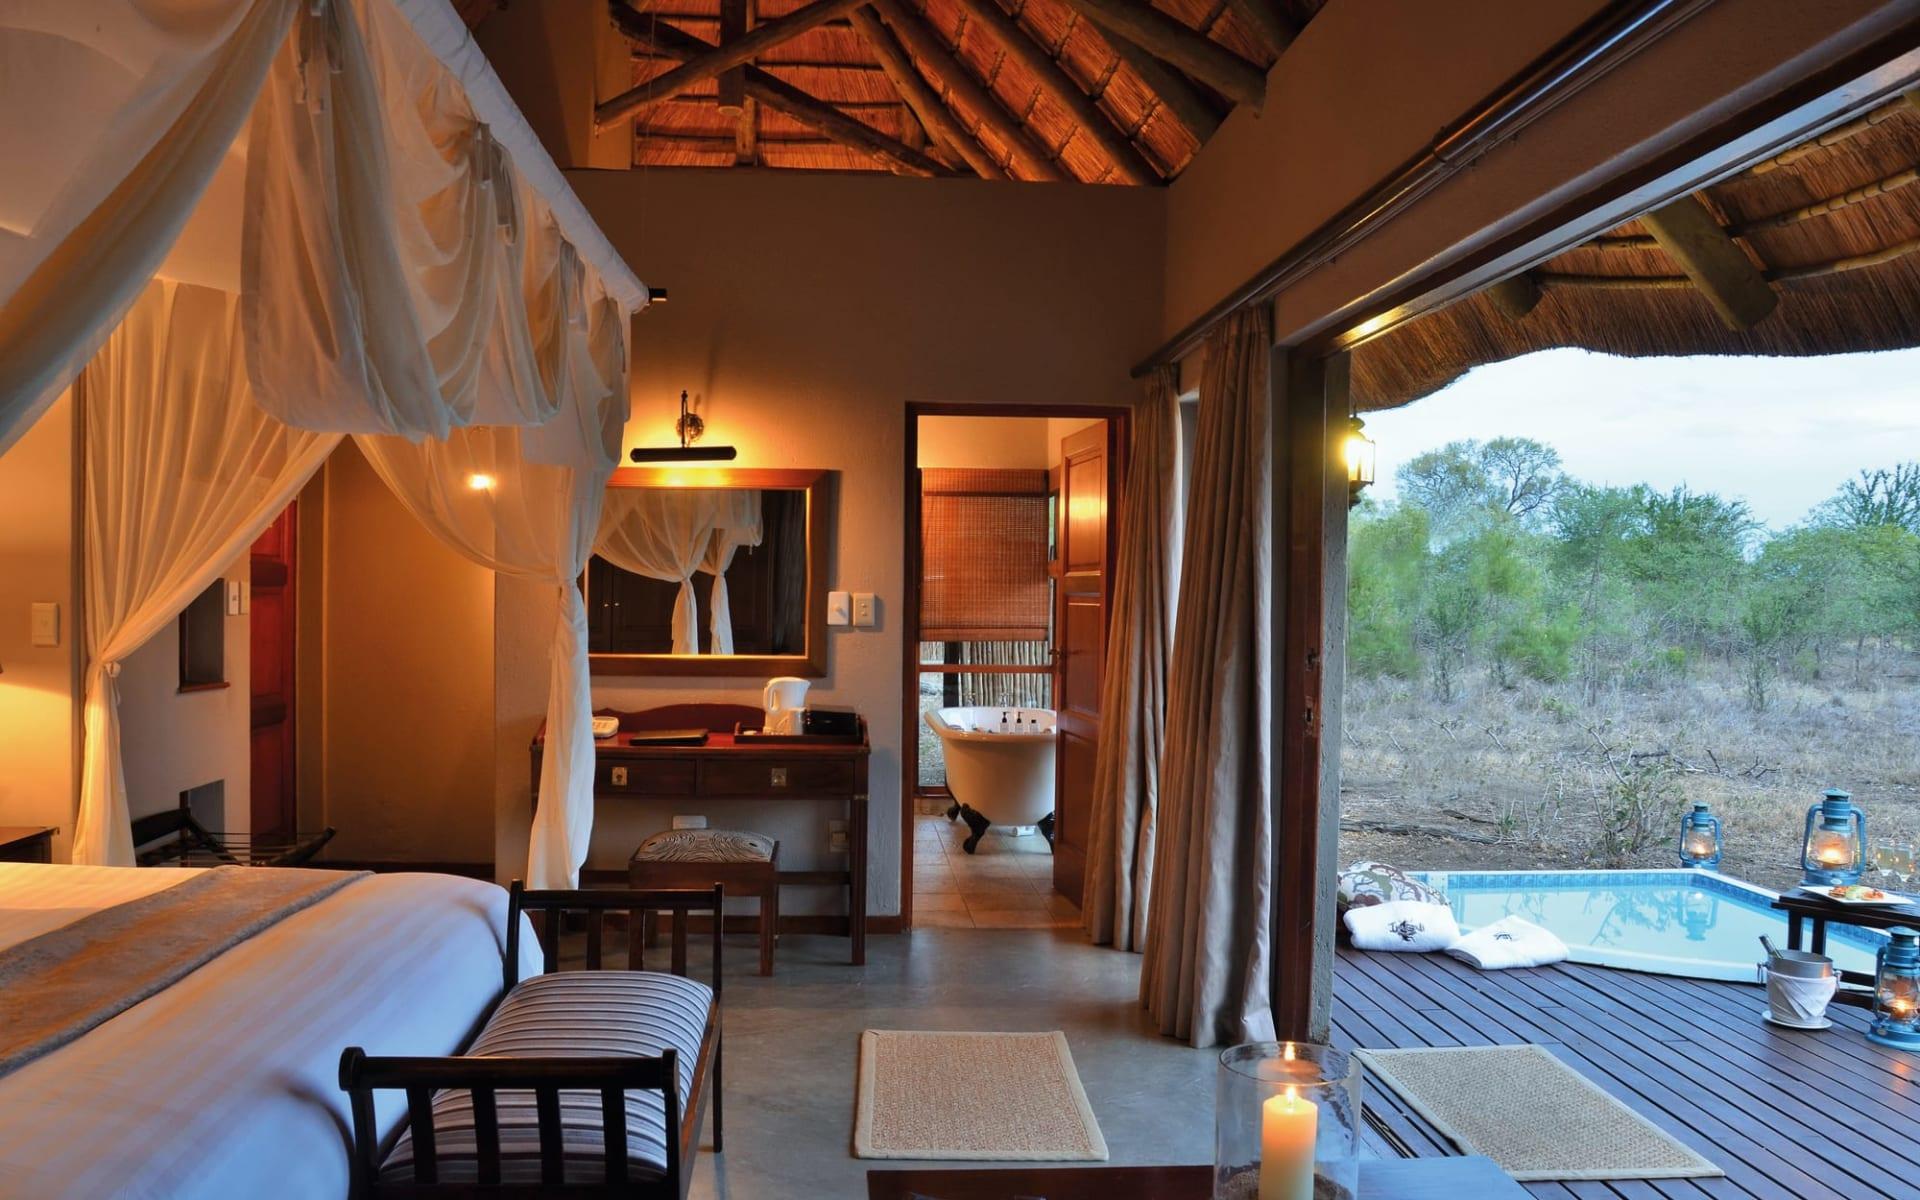 Imbali Safari Lodge in Krüger Nationalpark:  Imbali Safari Lodge - Schlafzimmer mit Blick zur Veranda und Planschpool